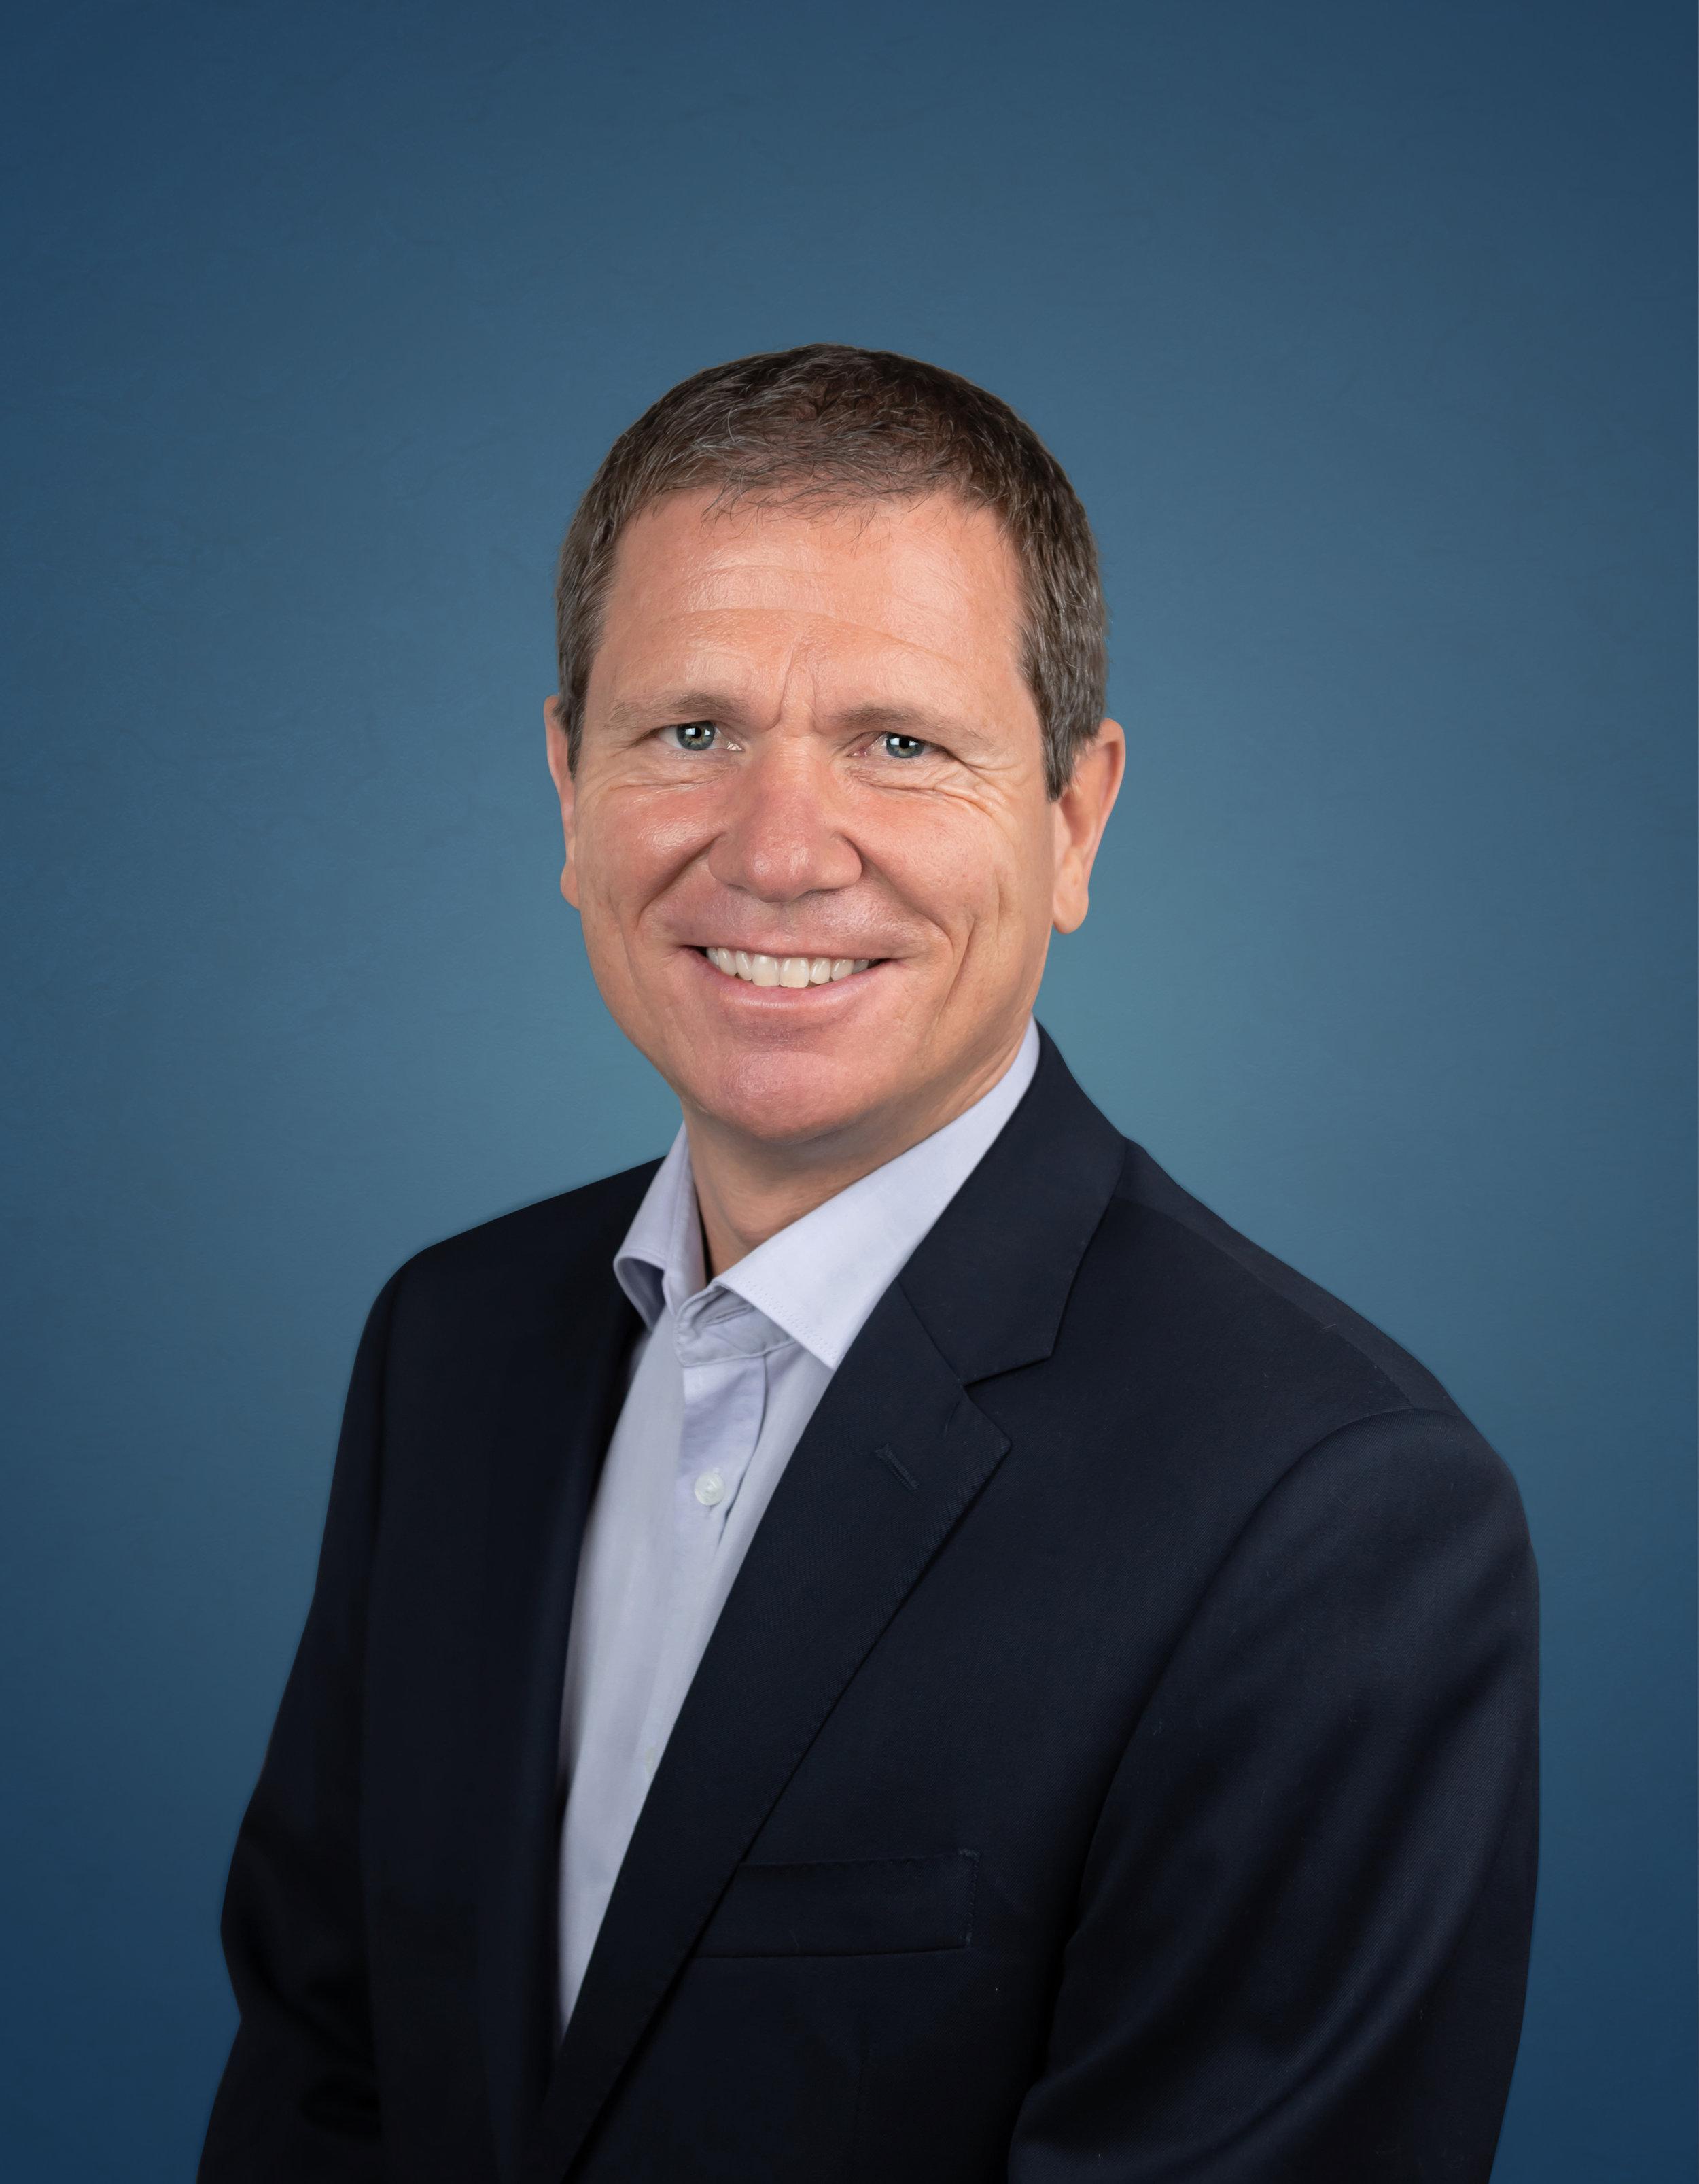 Ingo Riemer CEO Berg Pipe Group